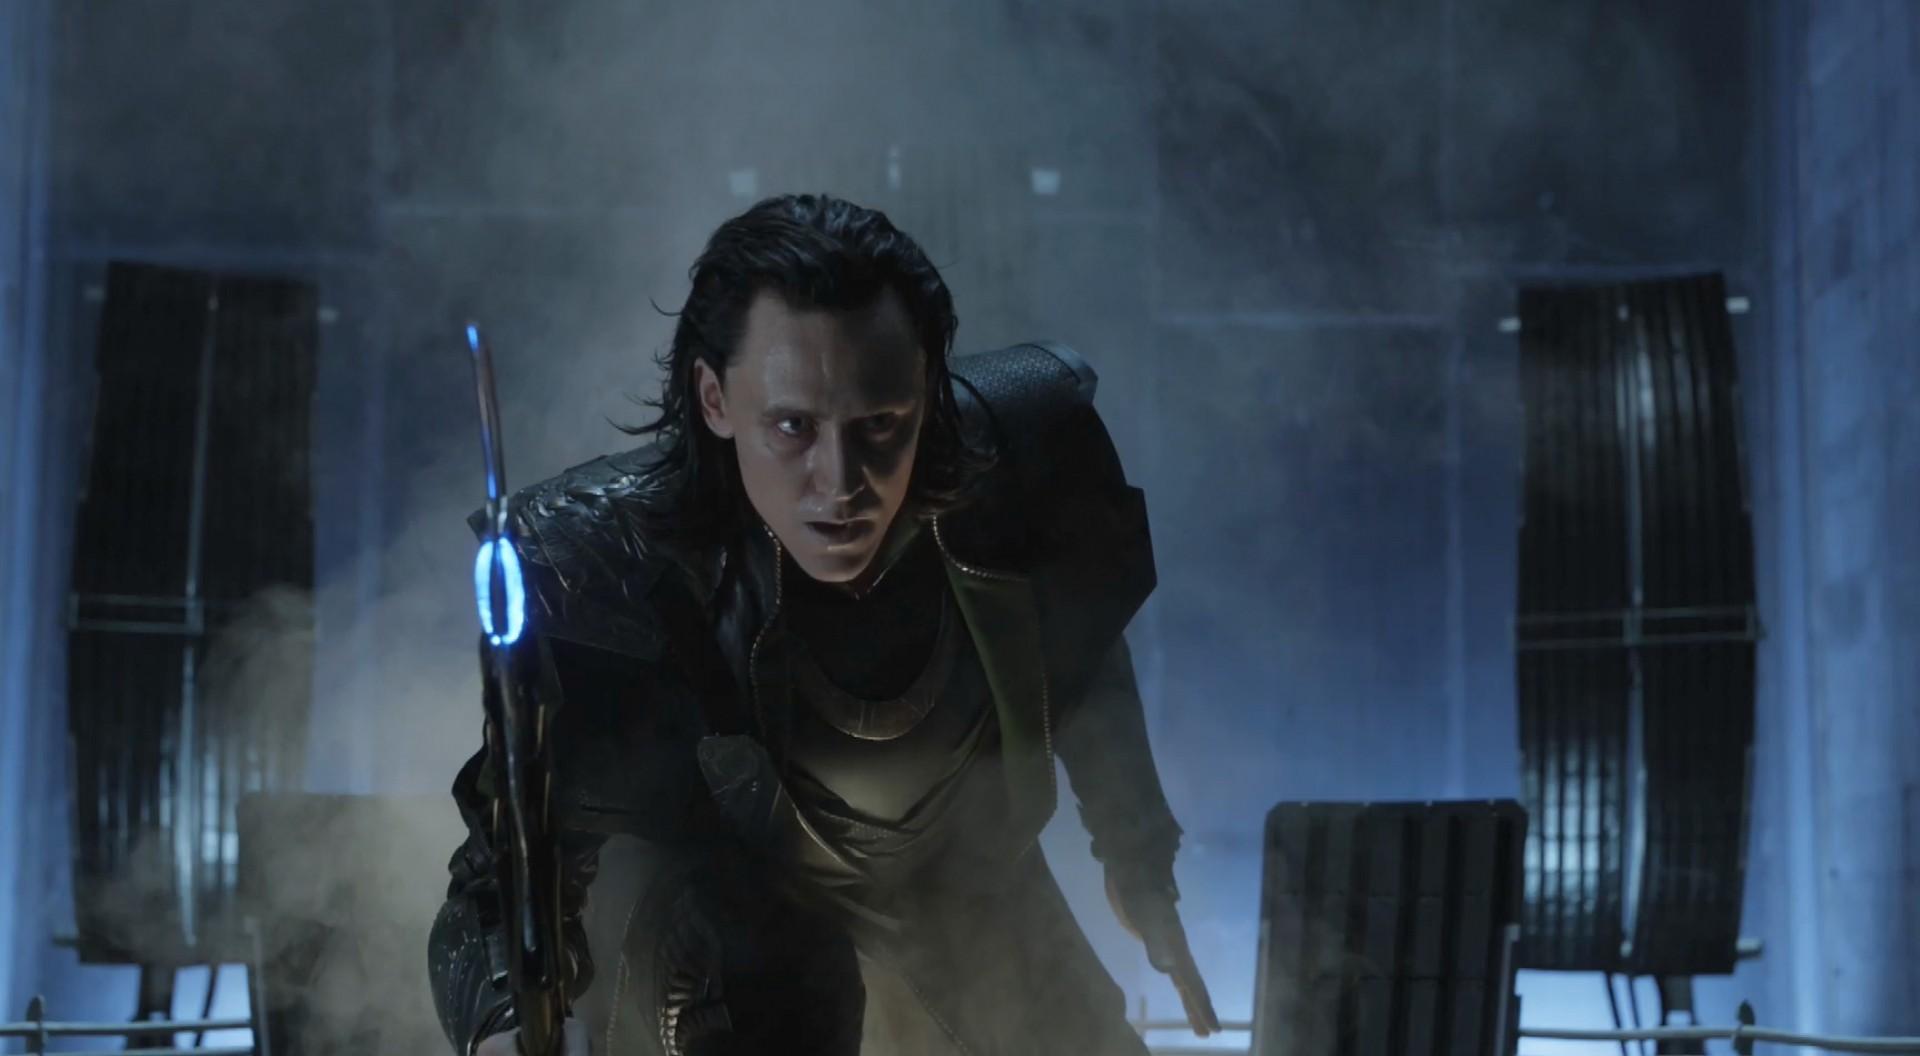 tom-hiddleston-as-loki-in-the-avengers-2012